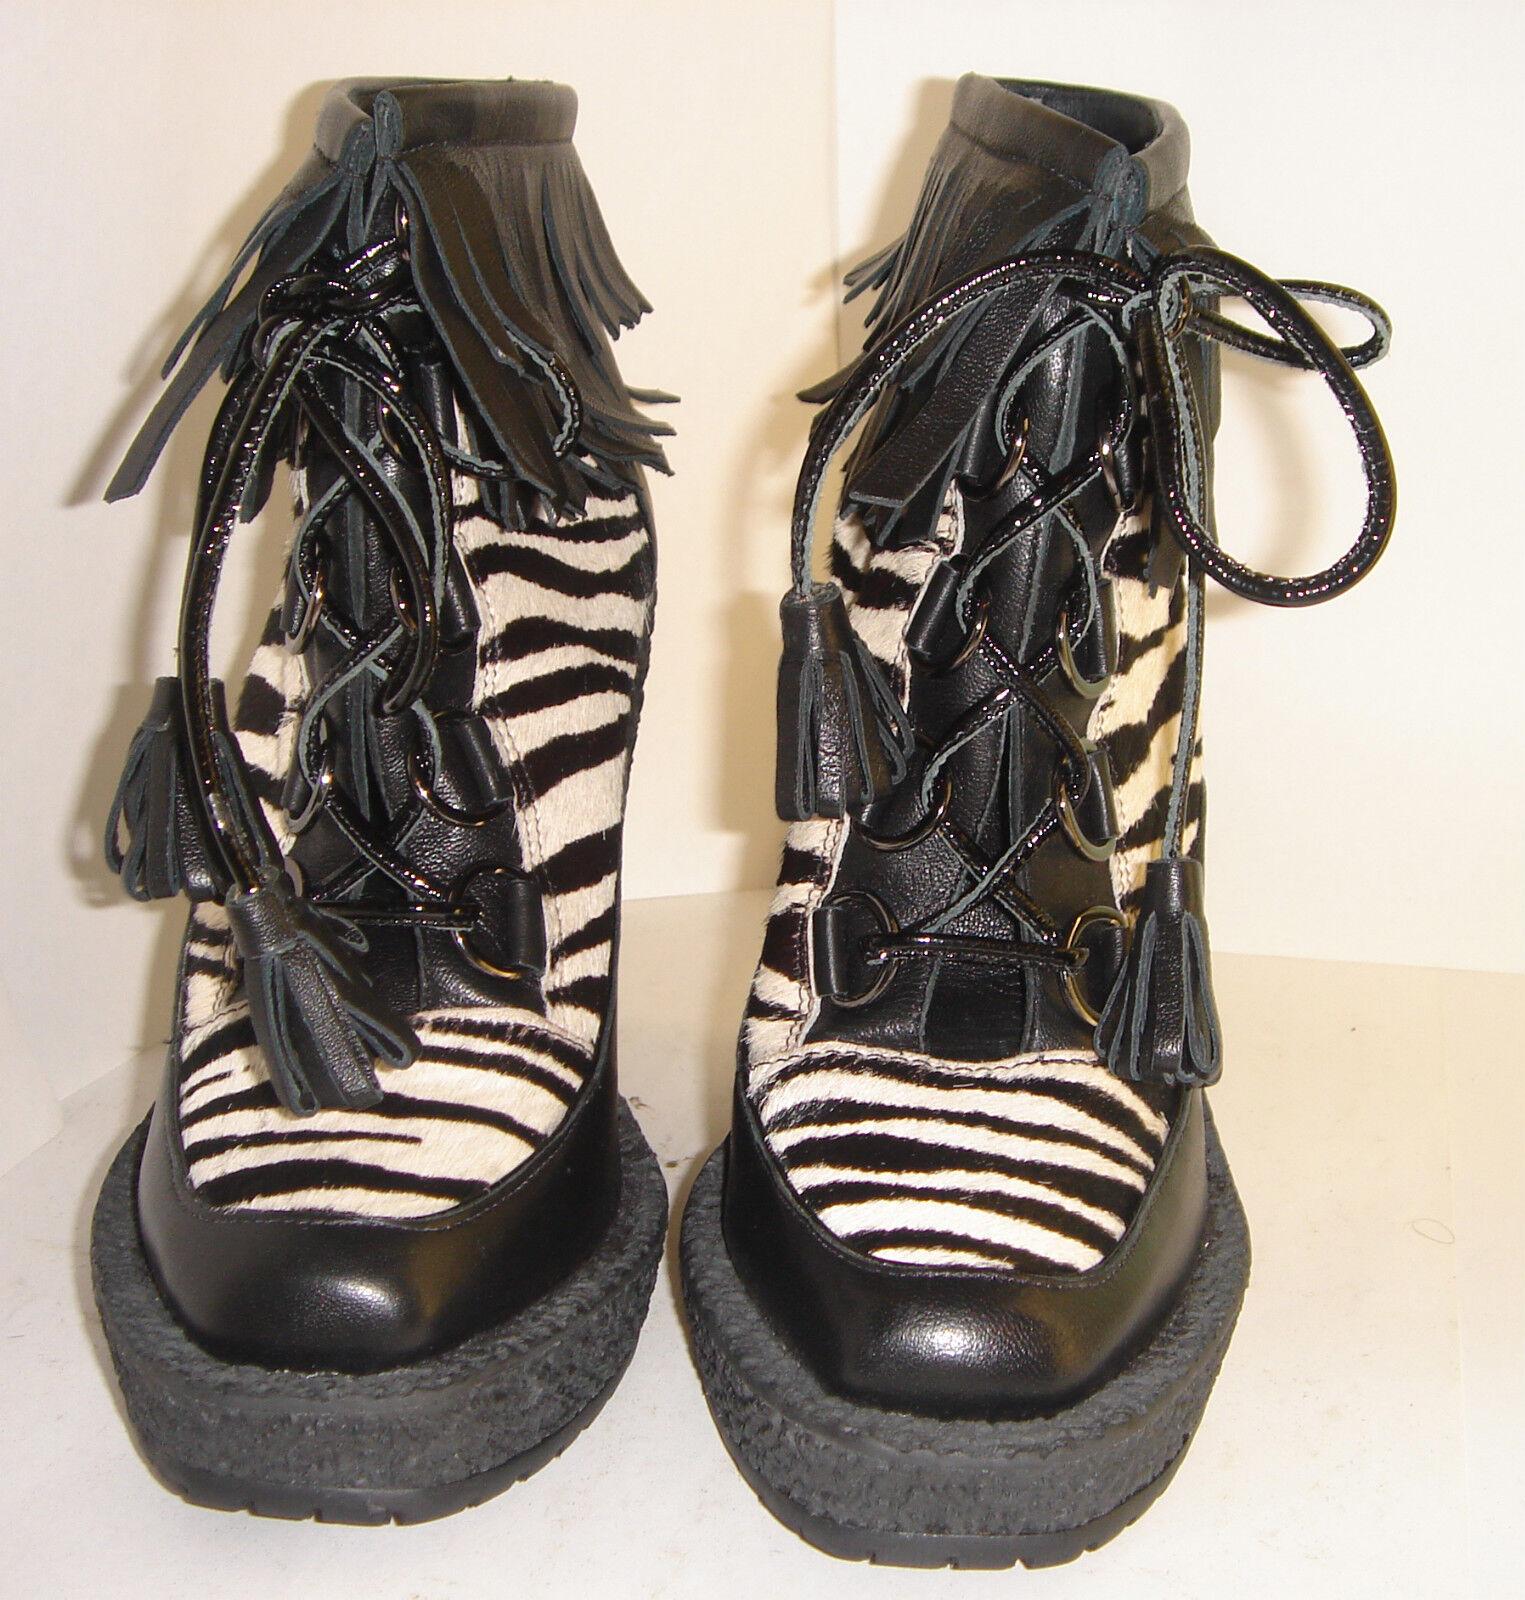 TOPSHOP BOUTIQUE EMMA COOK ZEBRA ANIMAL PRINT PLATFORM WEDGE ANKLE Stiefel Stiefel ANKLE 4 37 e87e4c